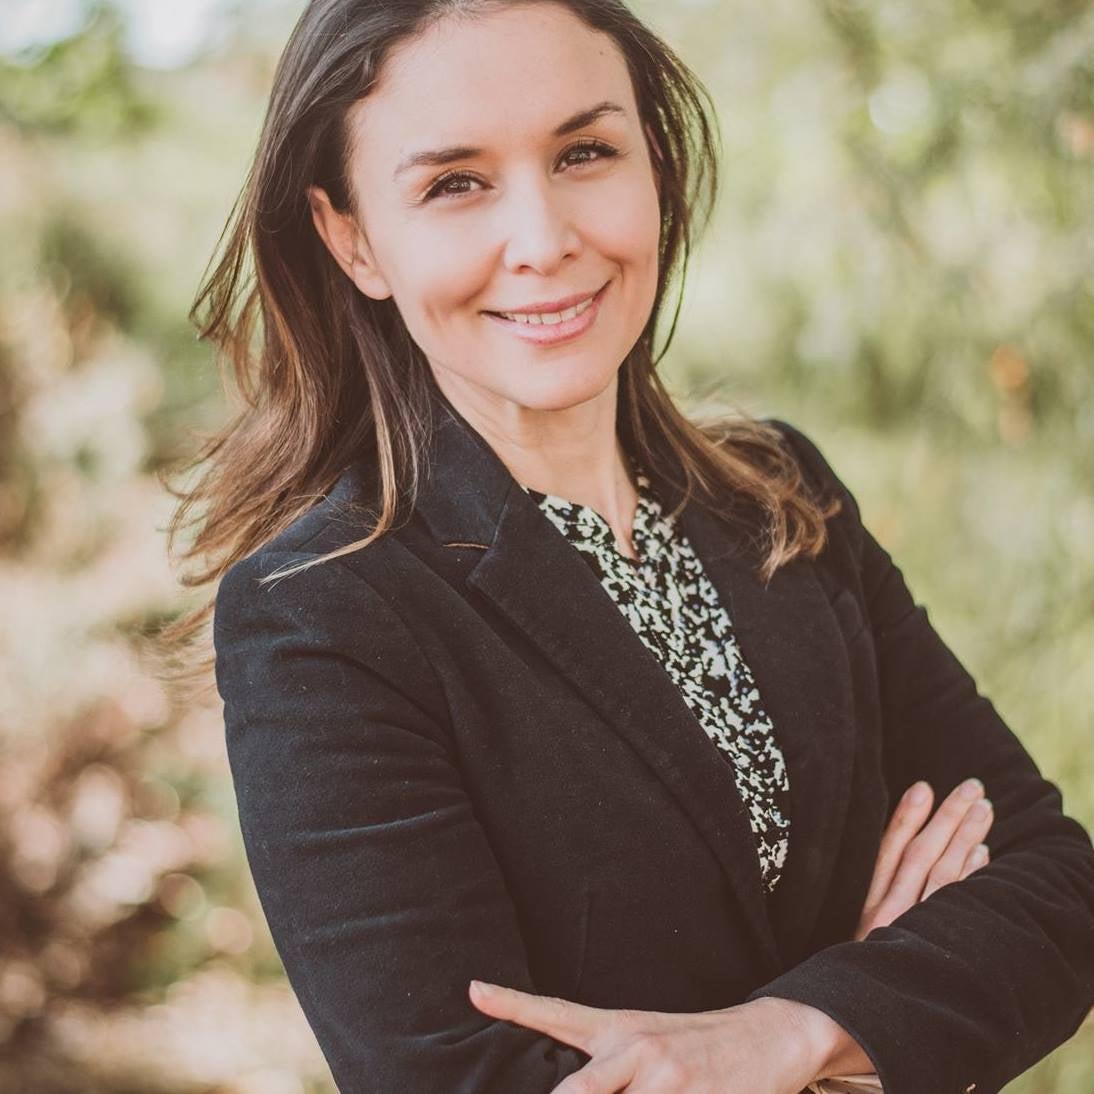 Cynthia Martínez